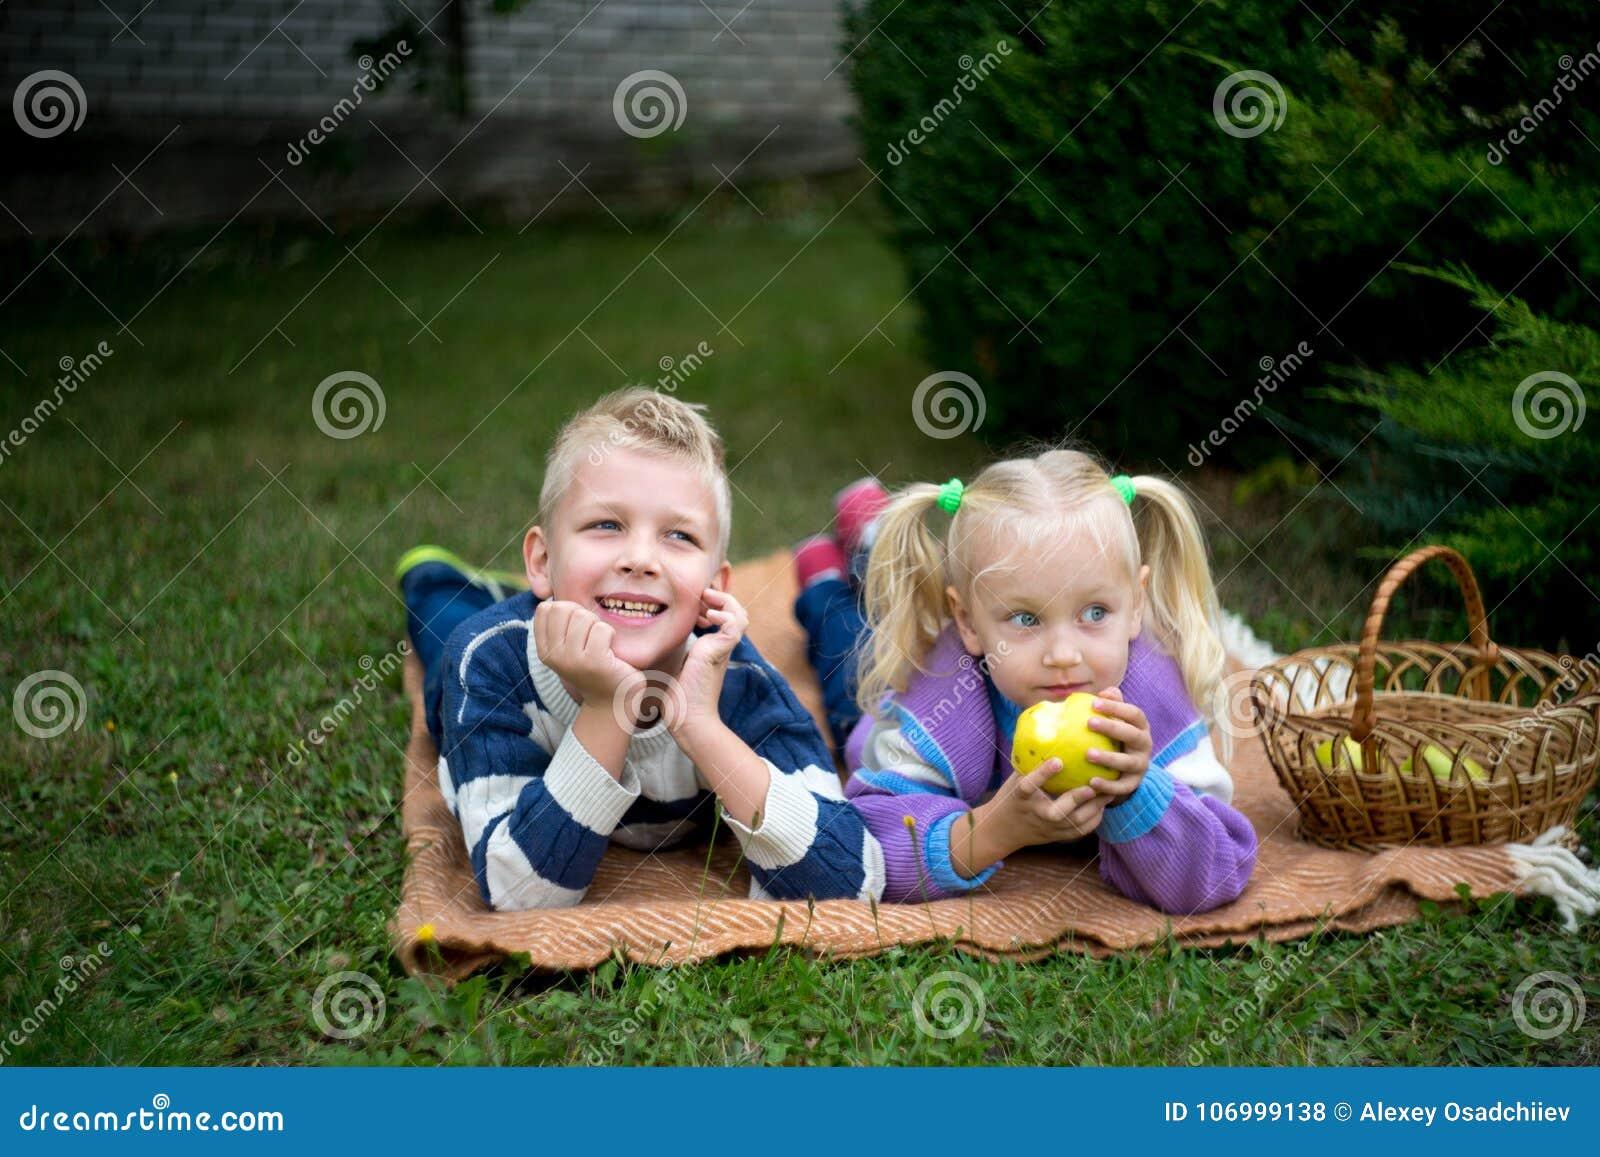 Girl boy picnic